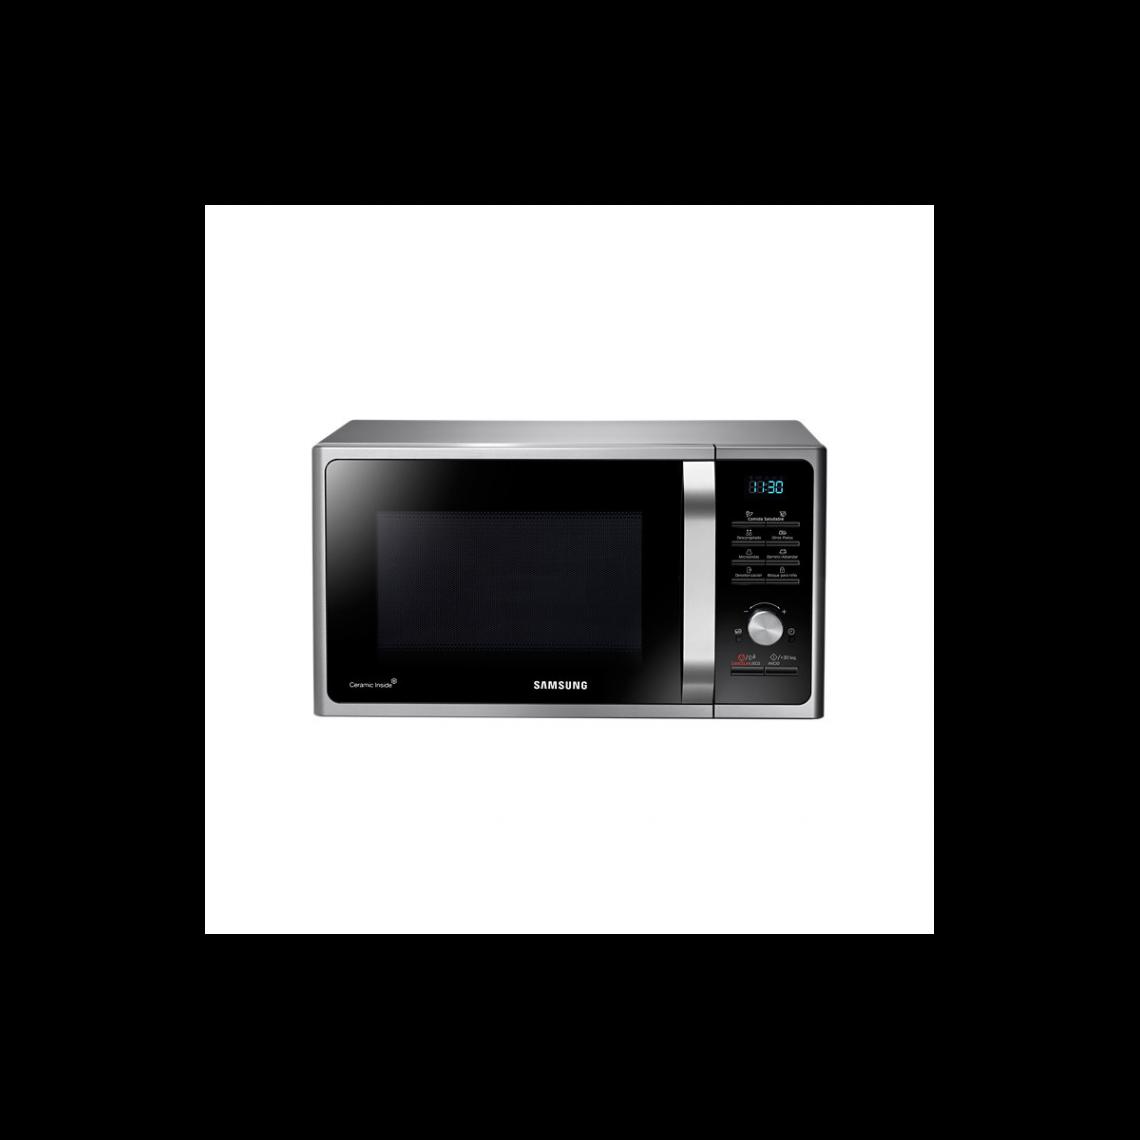 Samsung Micro-ondes SAMSUNG MS28F303TAS 28L 1100W